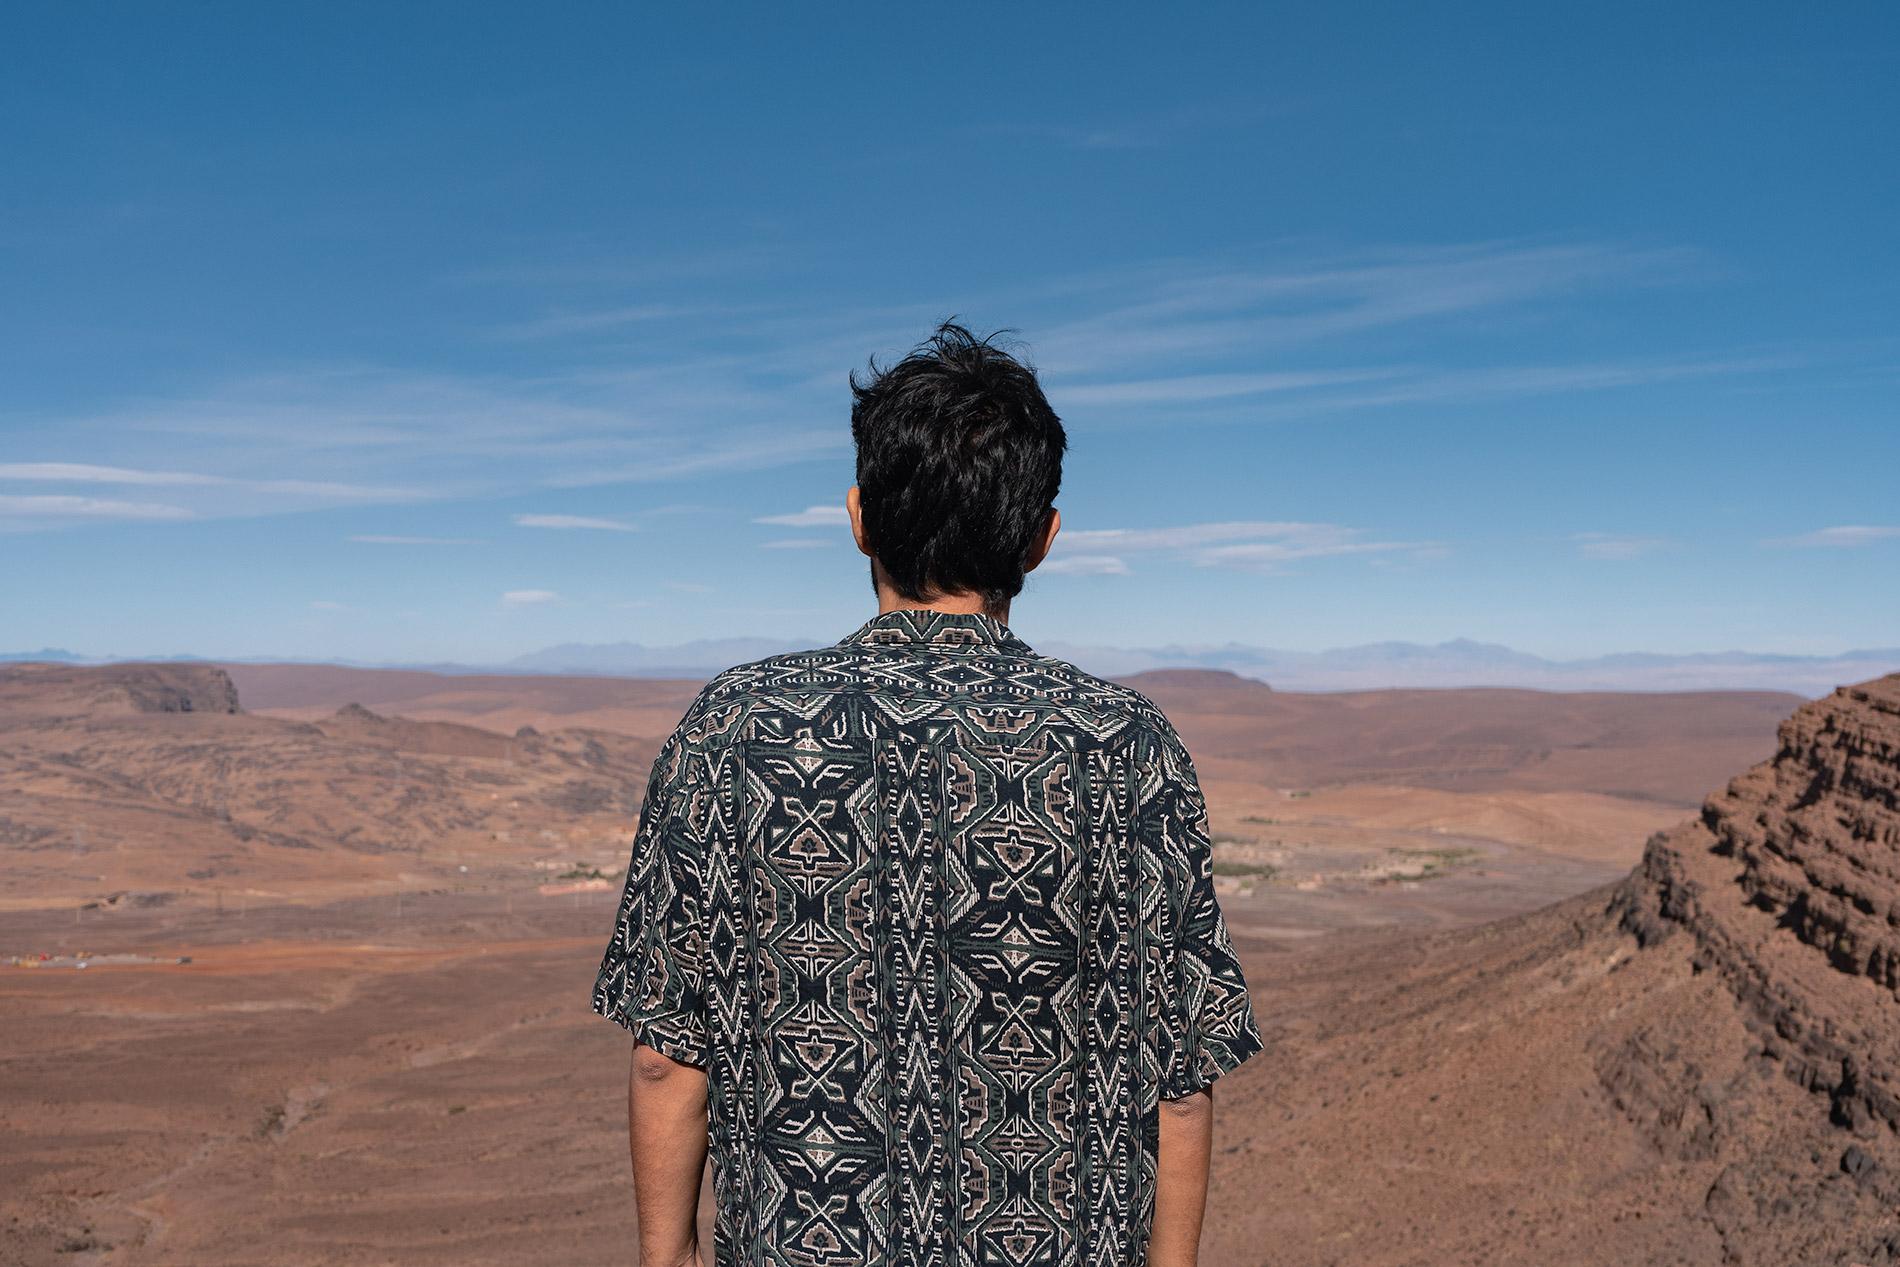 Rui taking in the arid views in Morocco